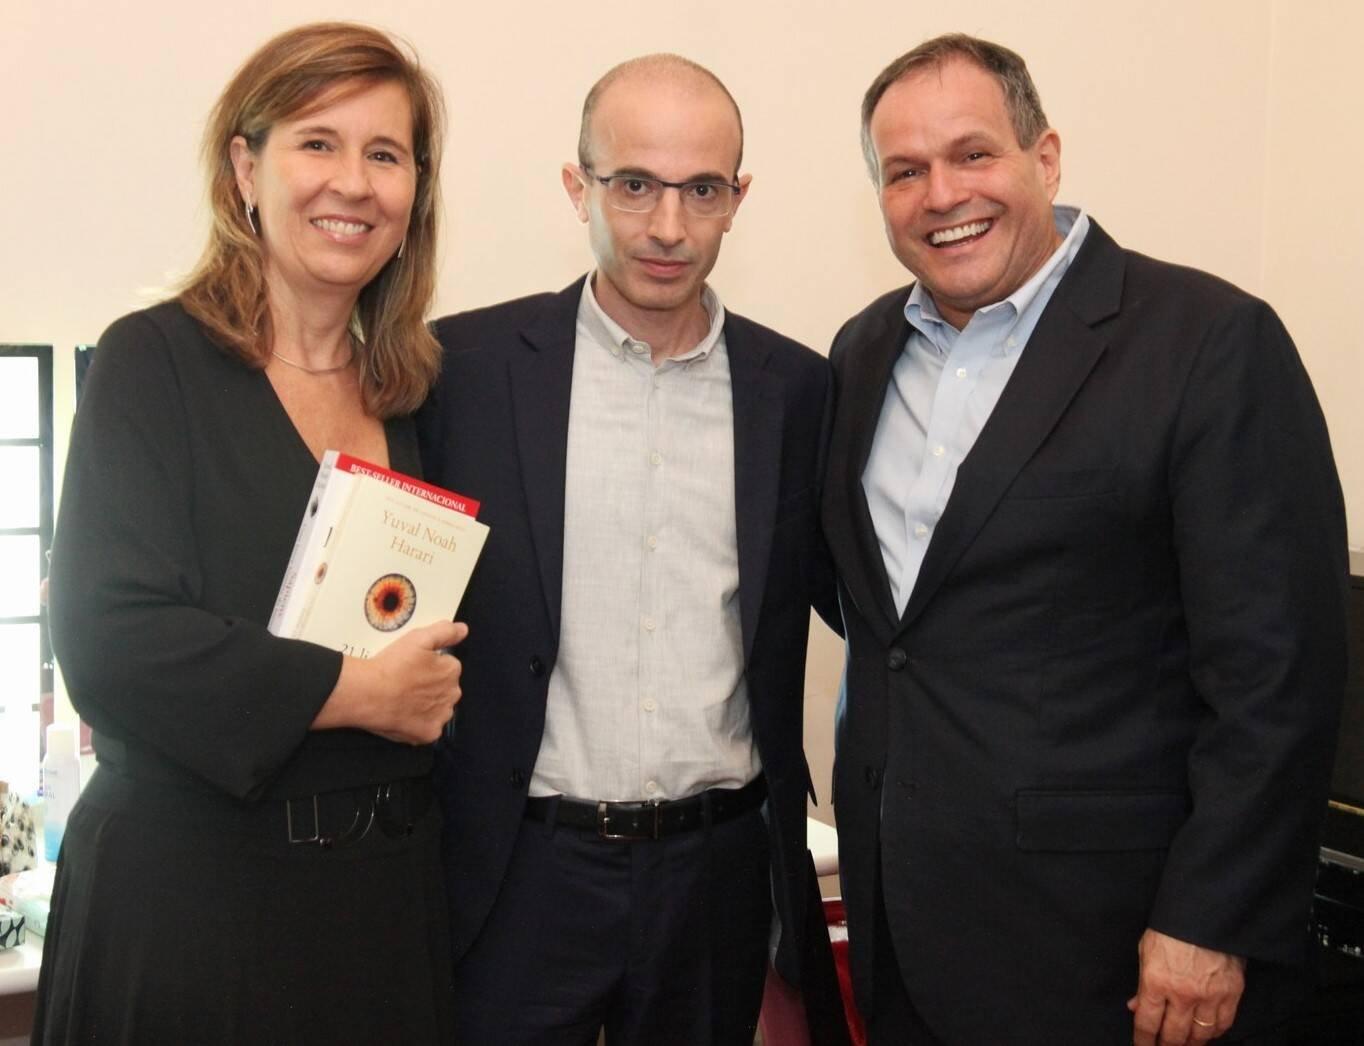 Yuval Noah Harari entre Rosângela e Júlio Campos /Foto: Vera Donatos